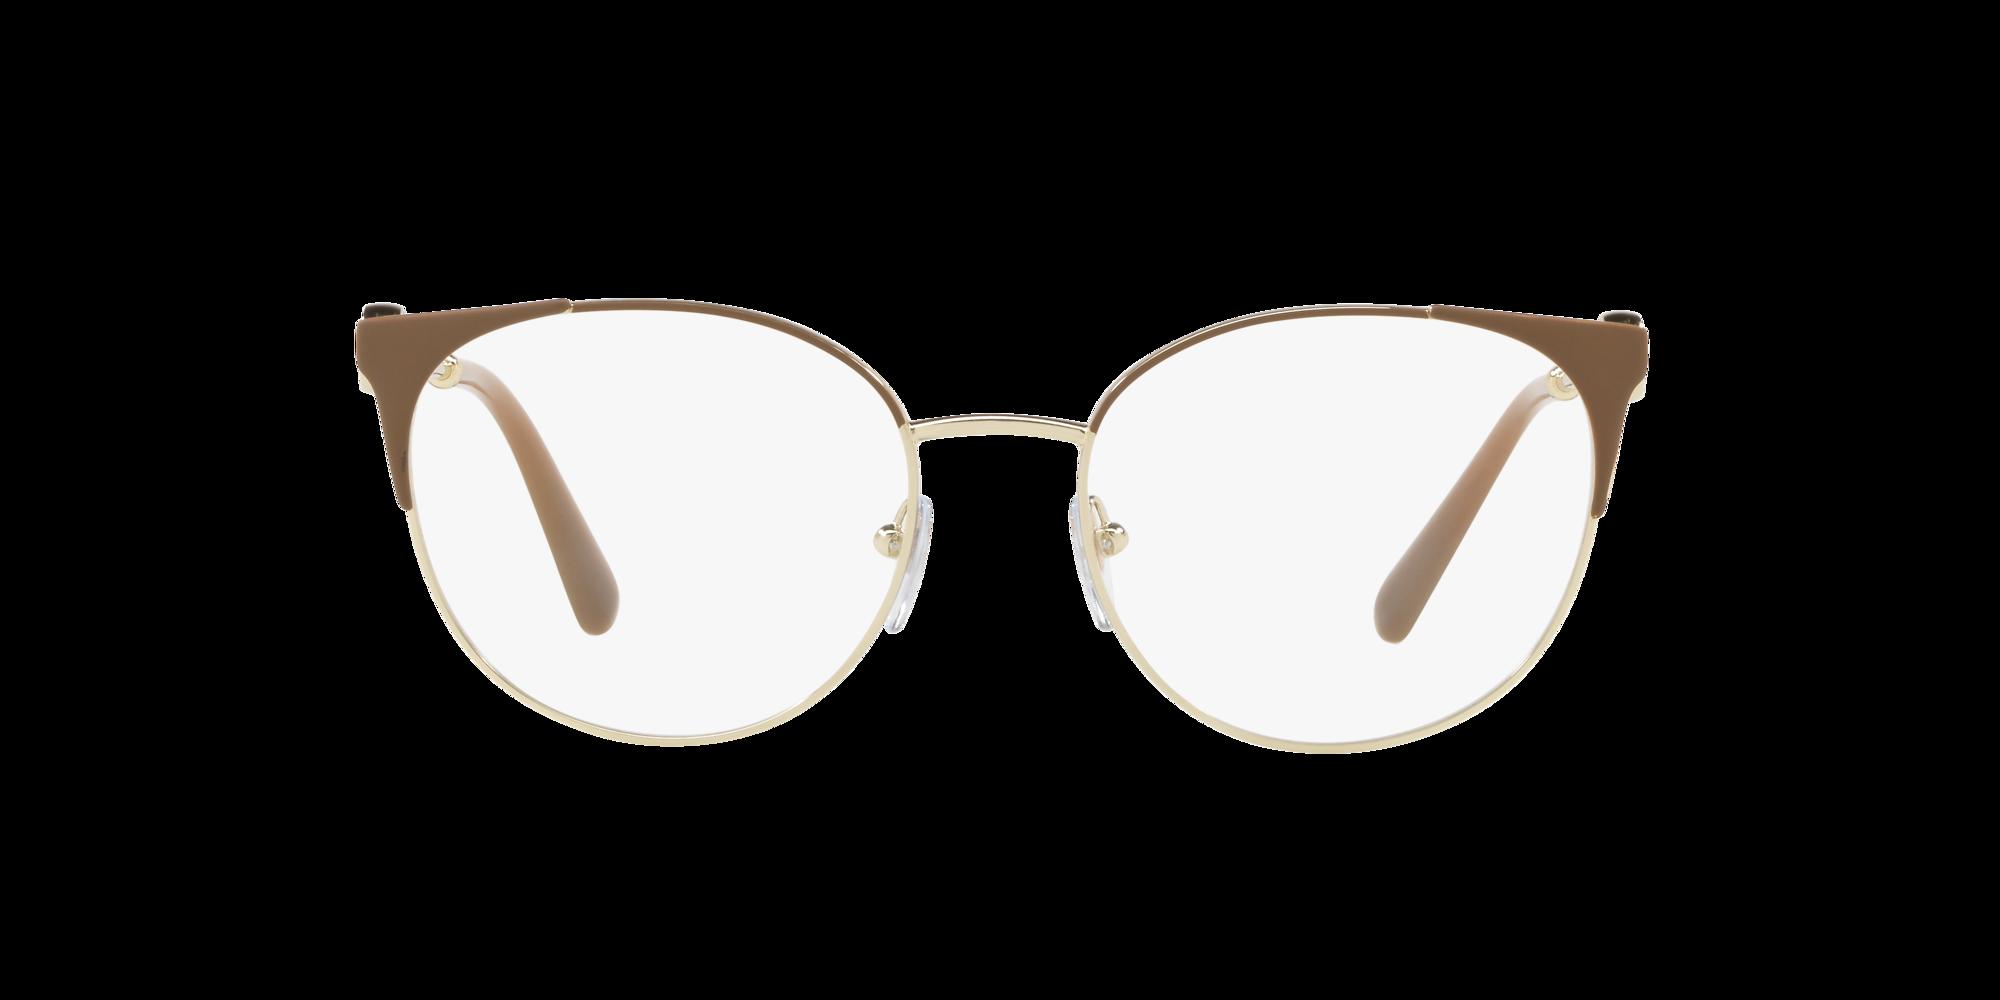 Image for BV2203 from LensCrafters | Glasses, Prescription Glasses Online, Eyewear